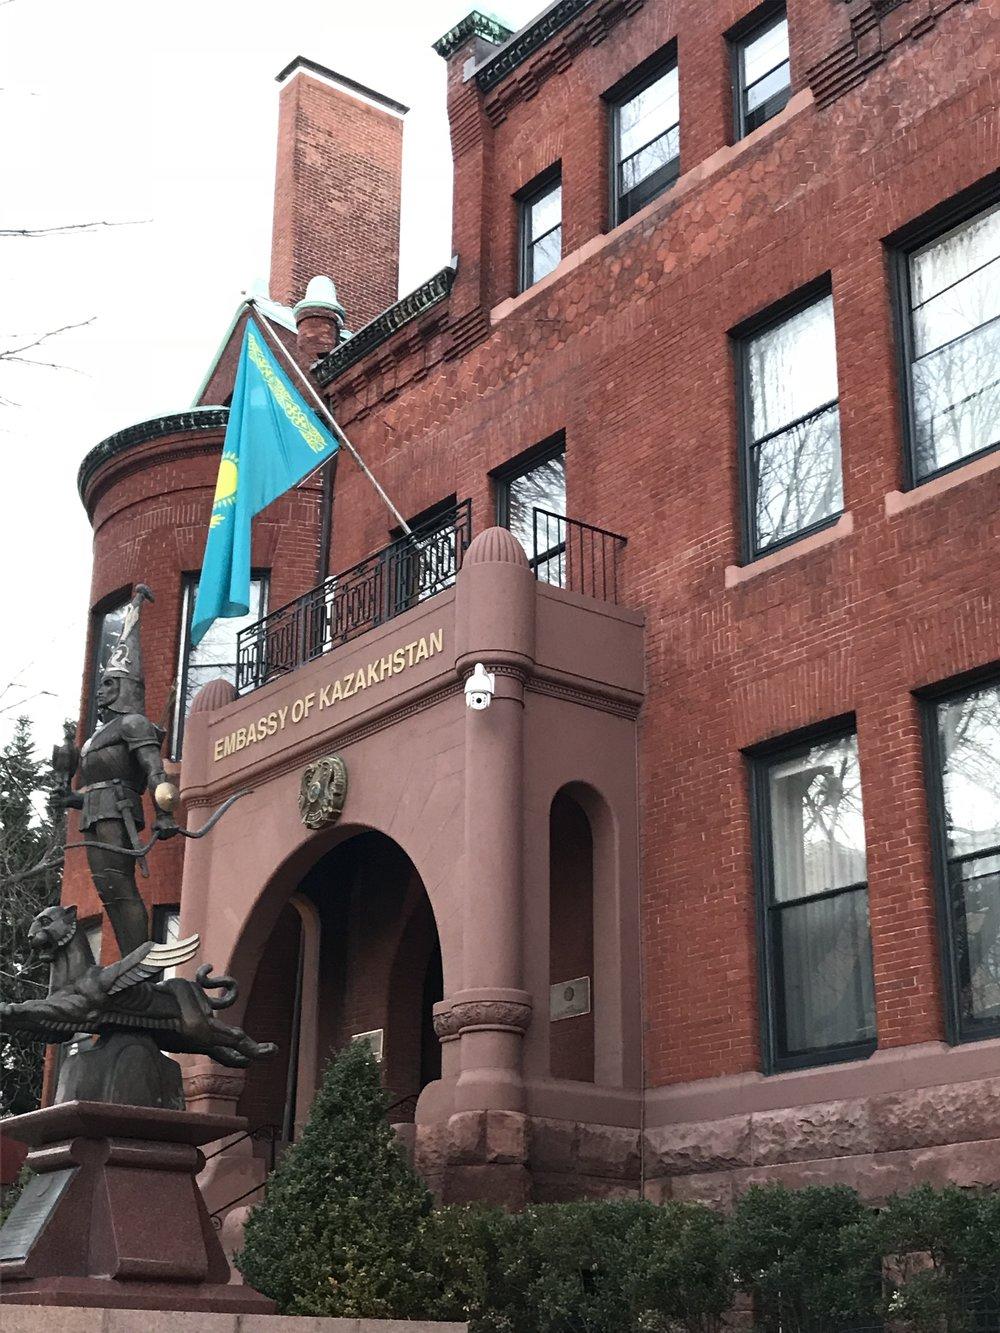 The Golden Warrior statue outside the Embassy of Kazakhstan.